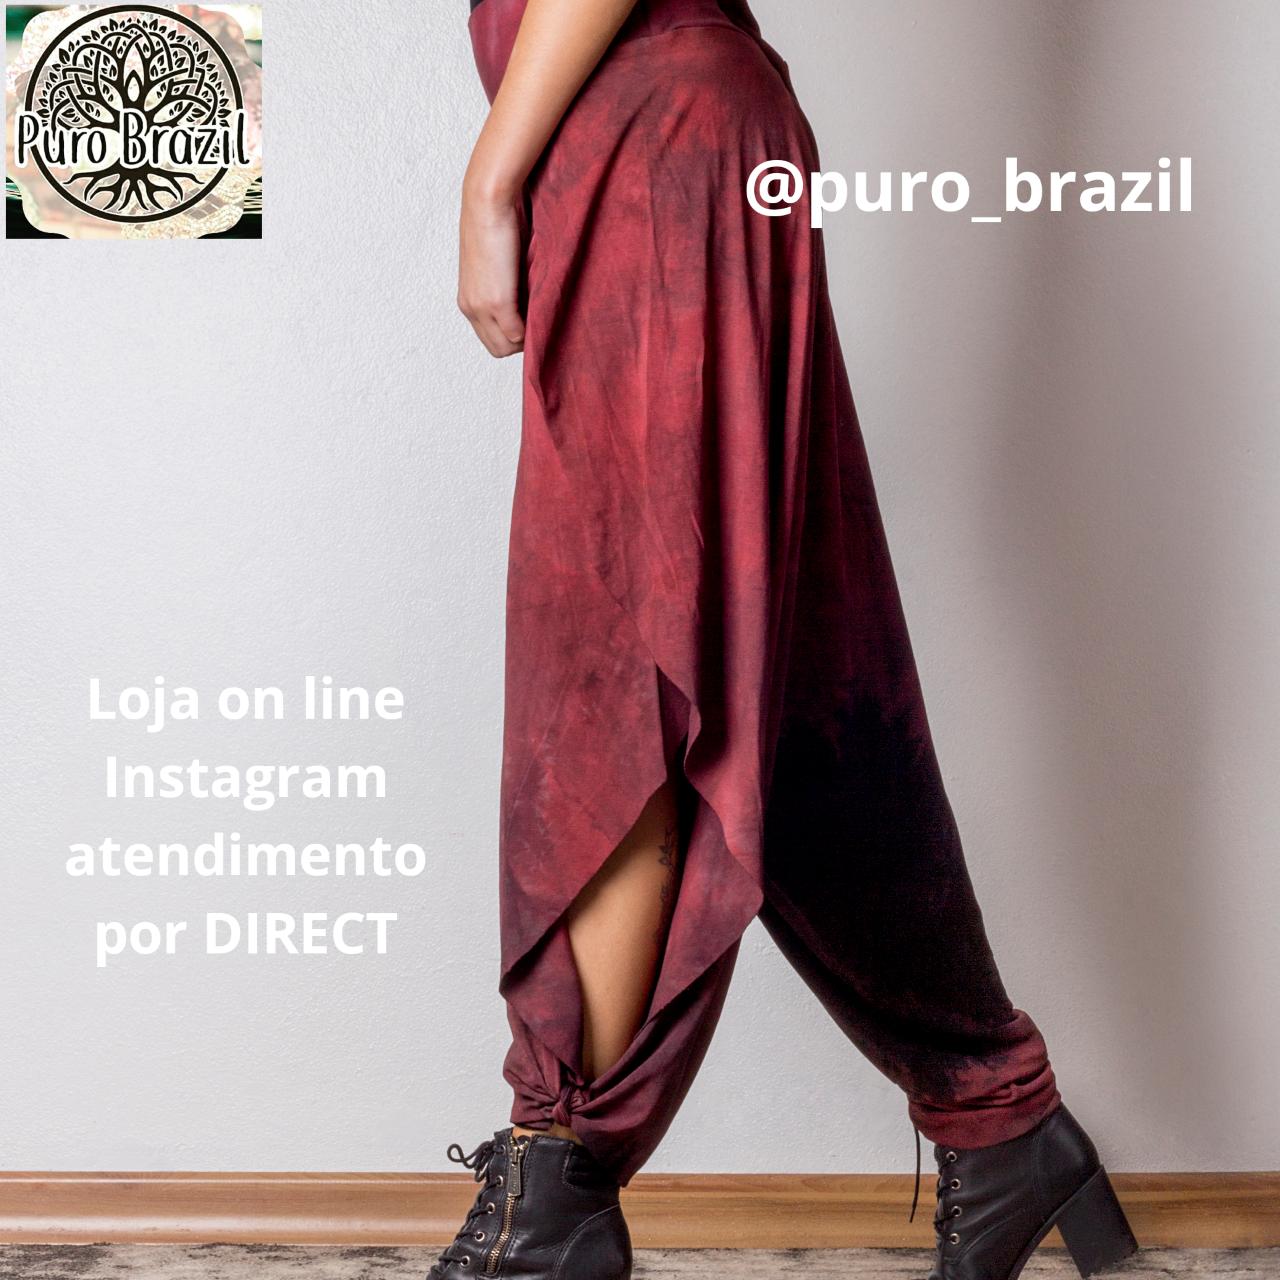 foto puro Brasil 02